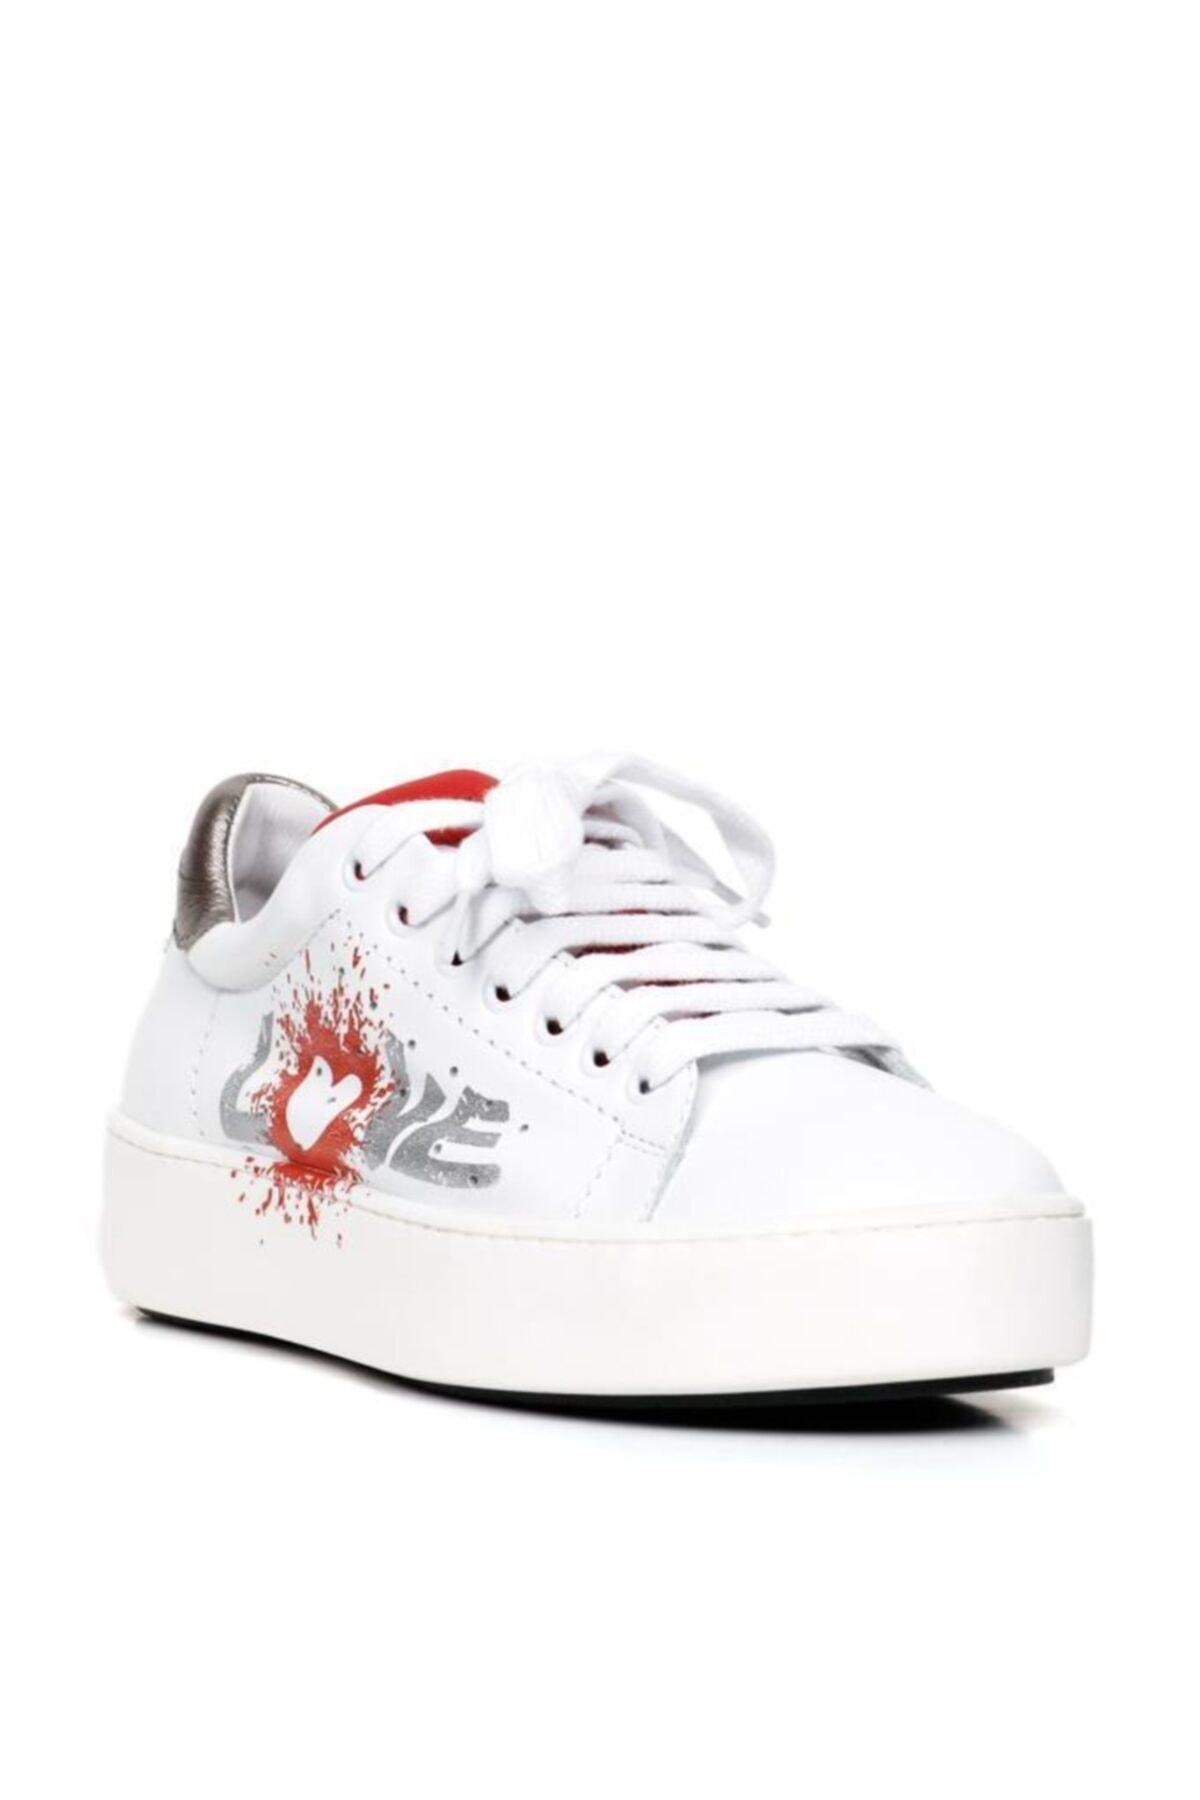 BUENO Shoes Kadın Spor 20wq5001-hea-lve 2